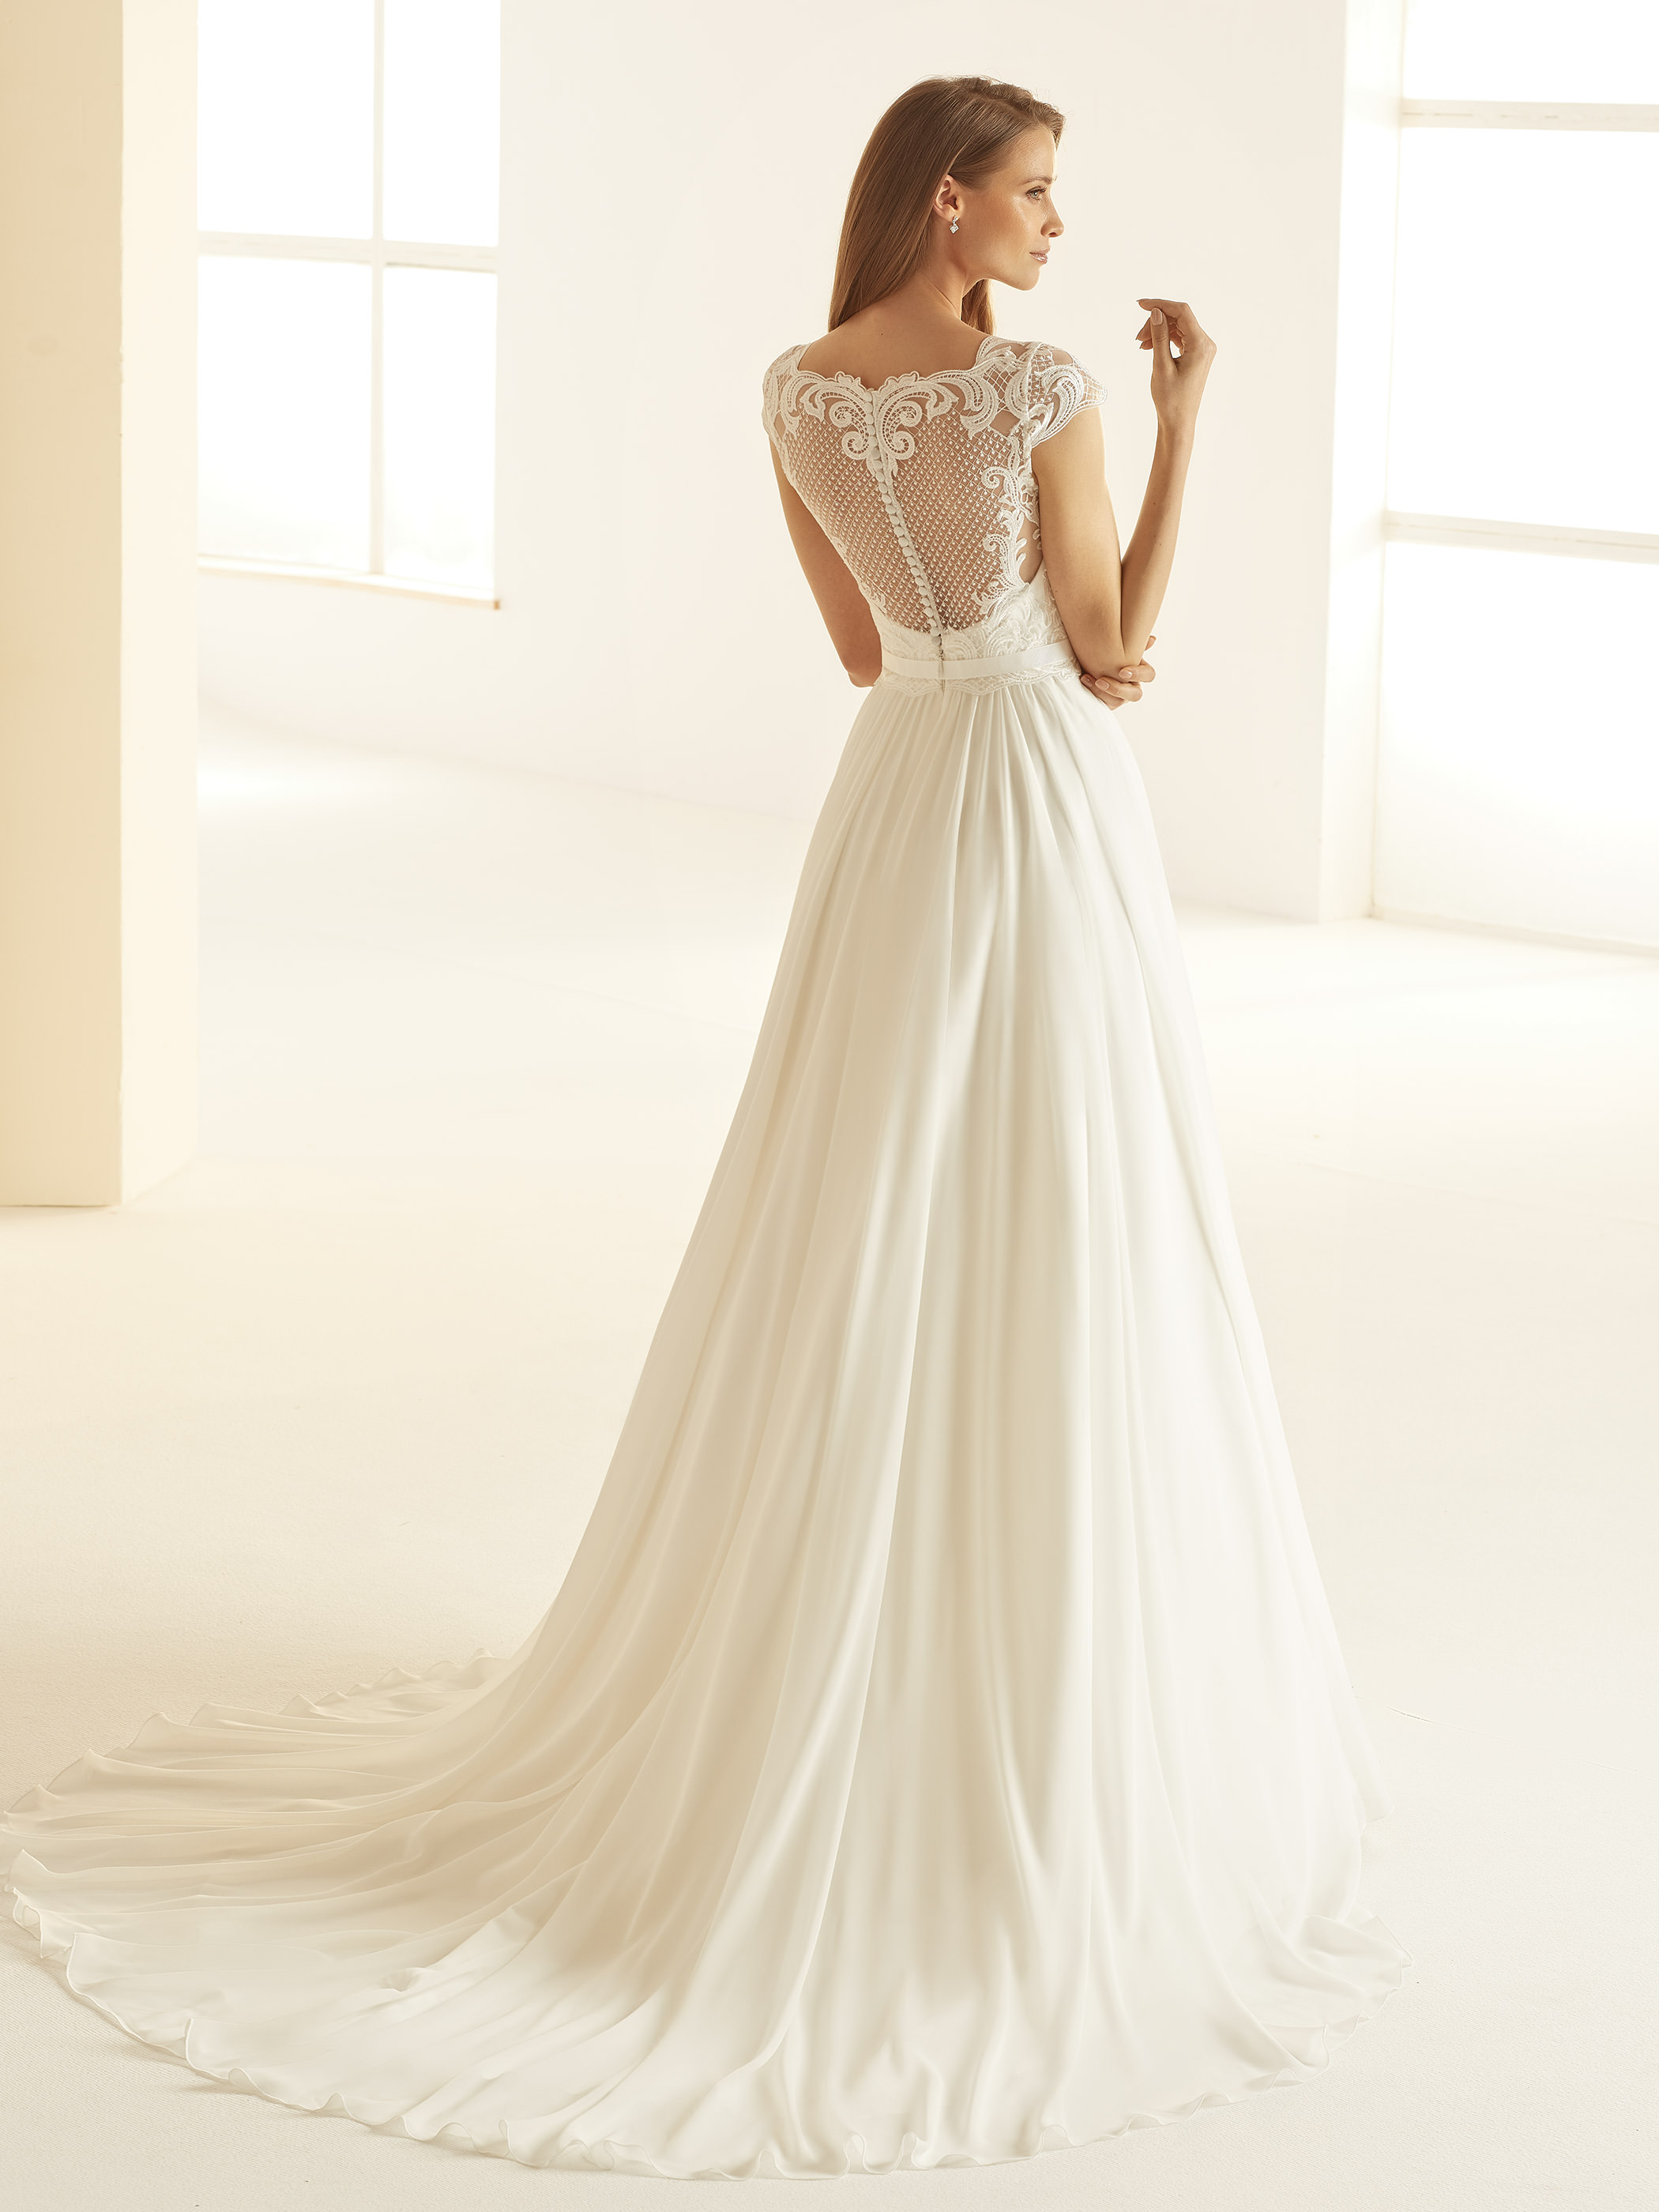 OLIVIA-Bianco-Evento-bridal-dress-(3)